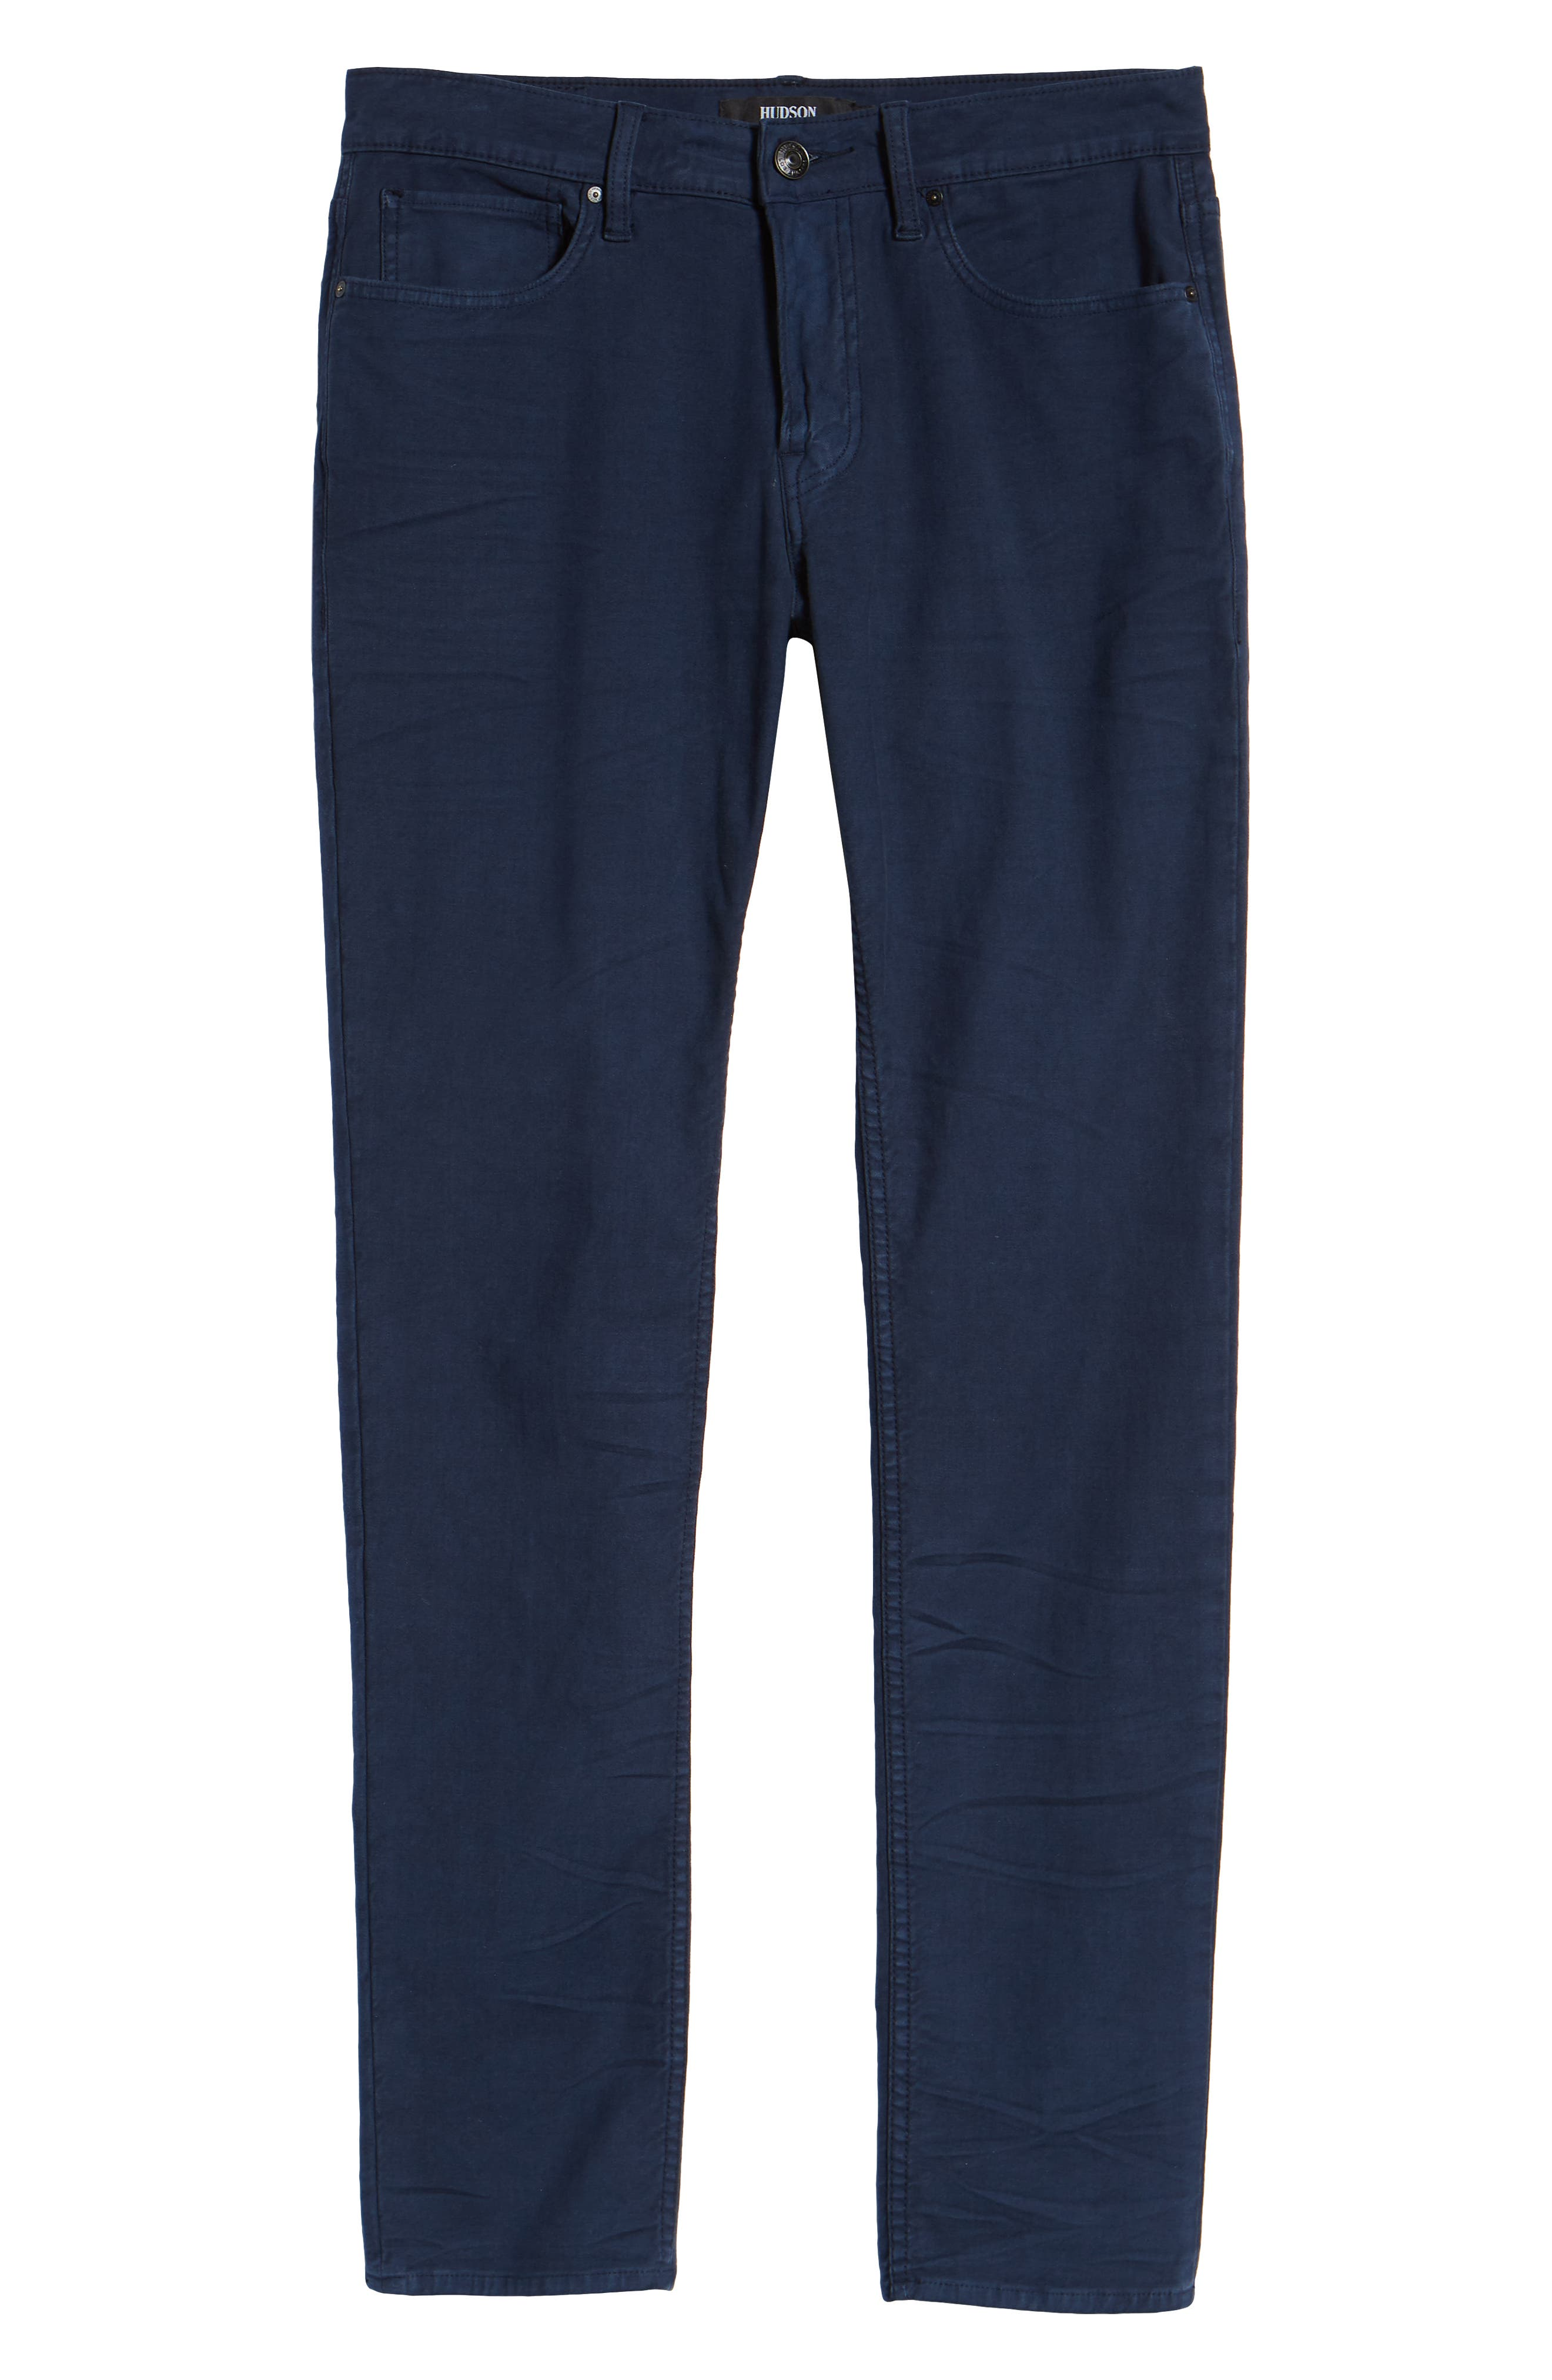 HUDSON JEANS, Axl Skinny Fit Jeans, Alternate thumbnail 6, color, SAILOR BLUE